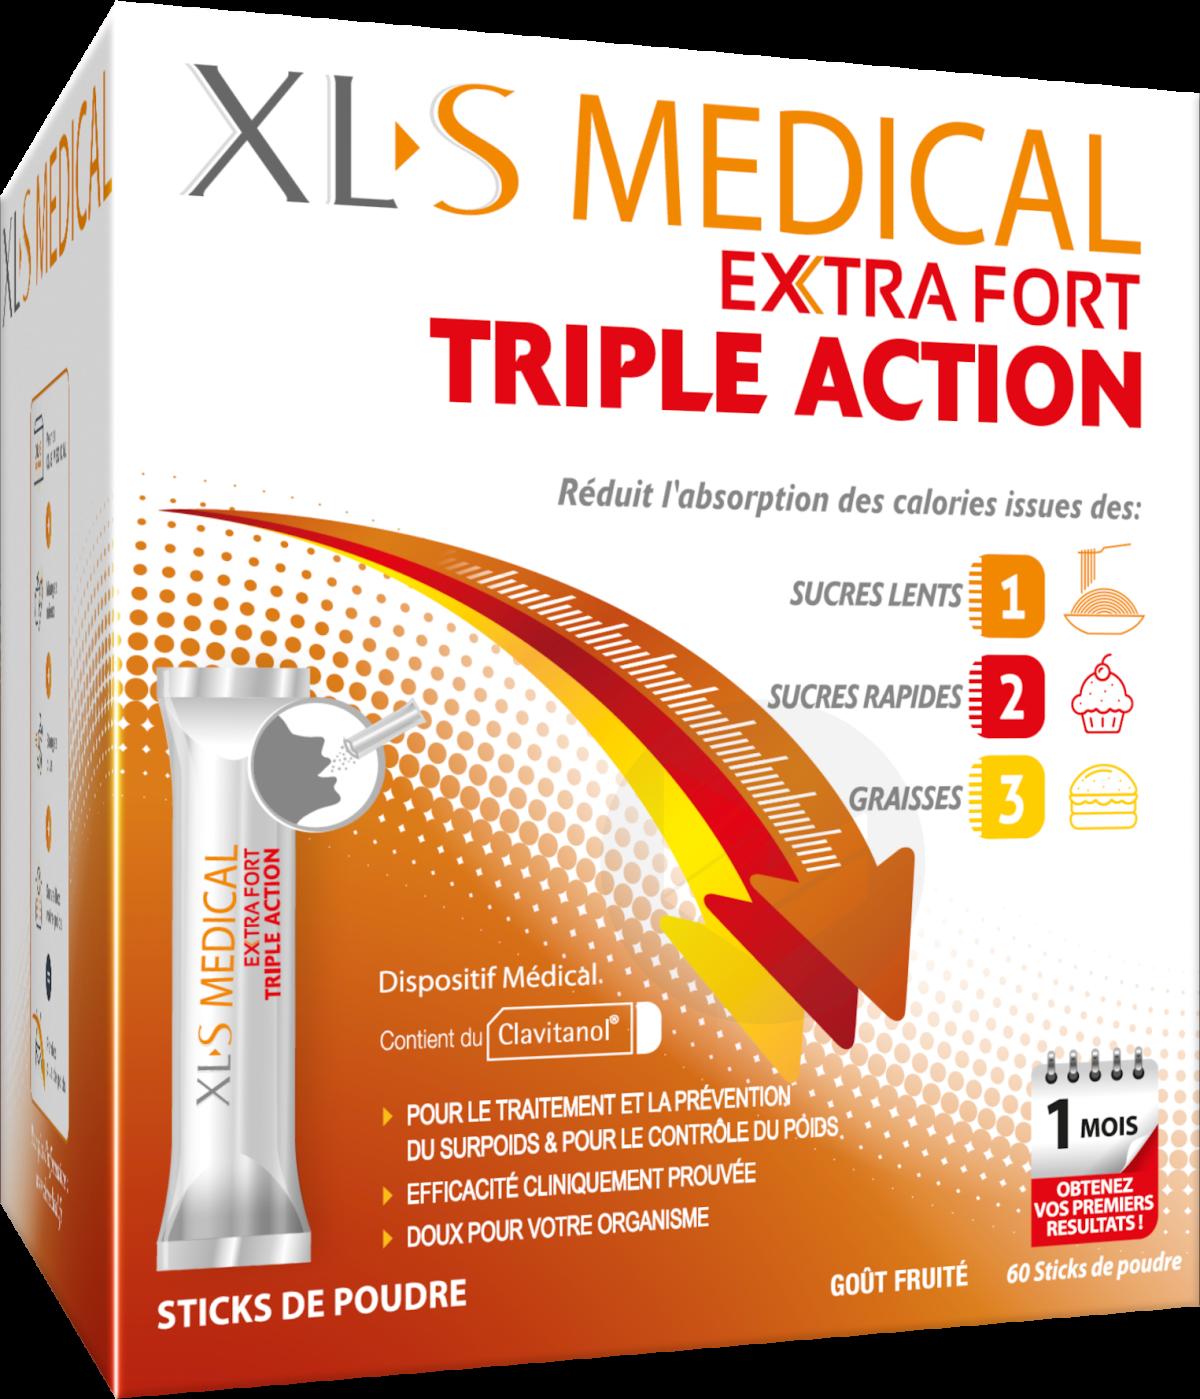 XL-S Medical Extra Fort 60 sticks